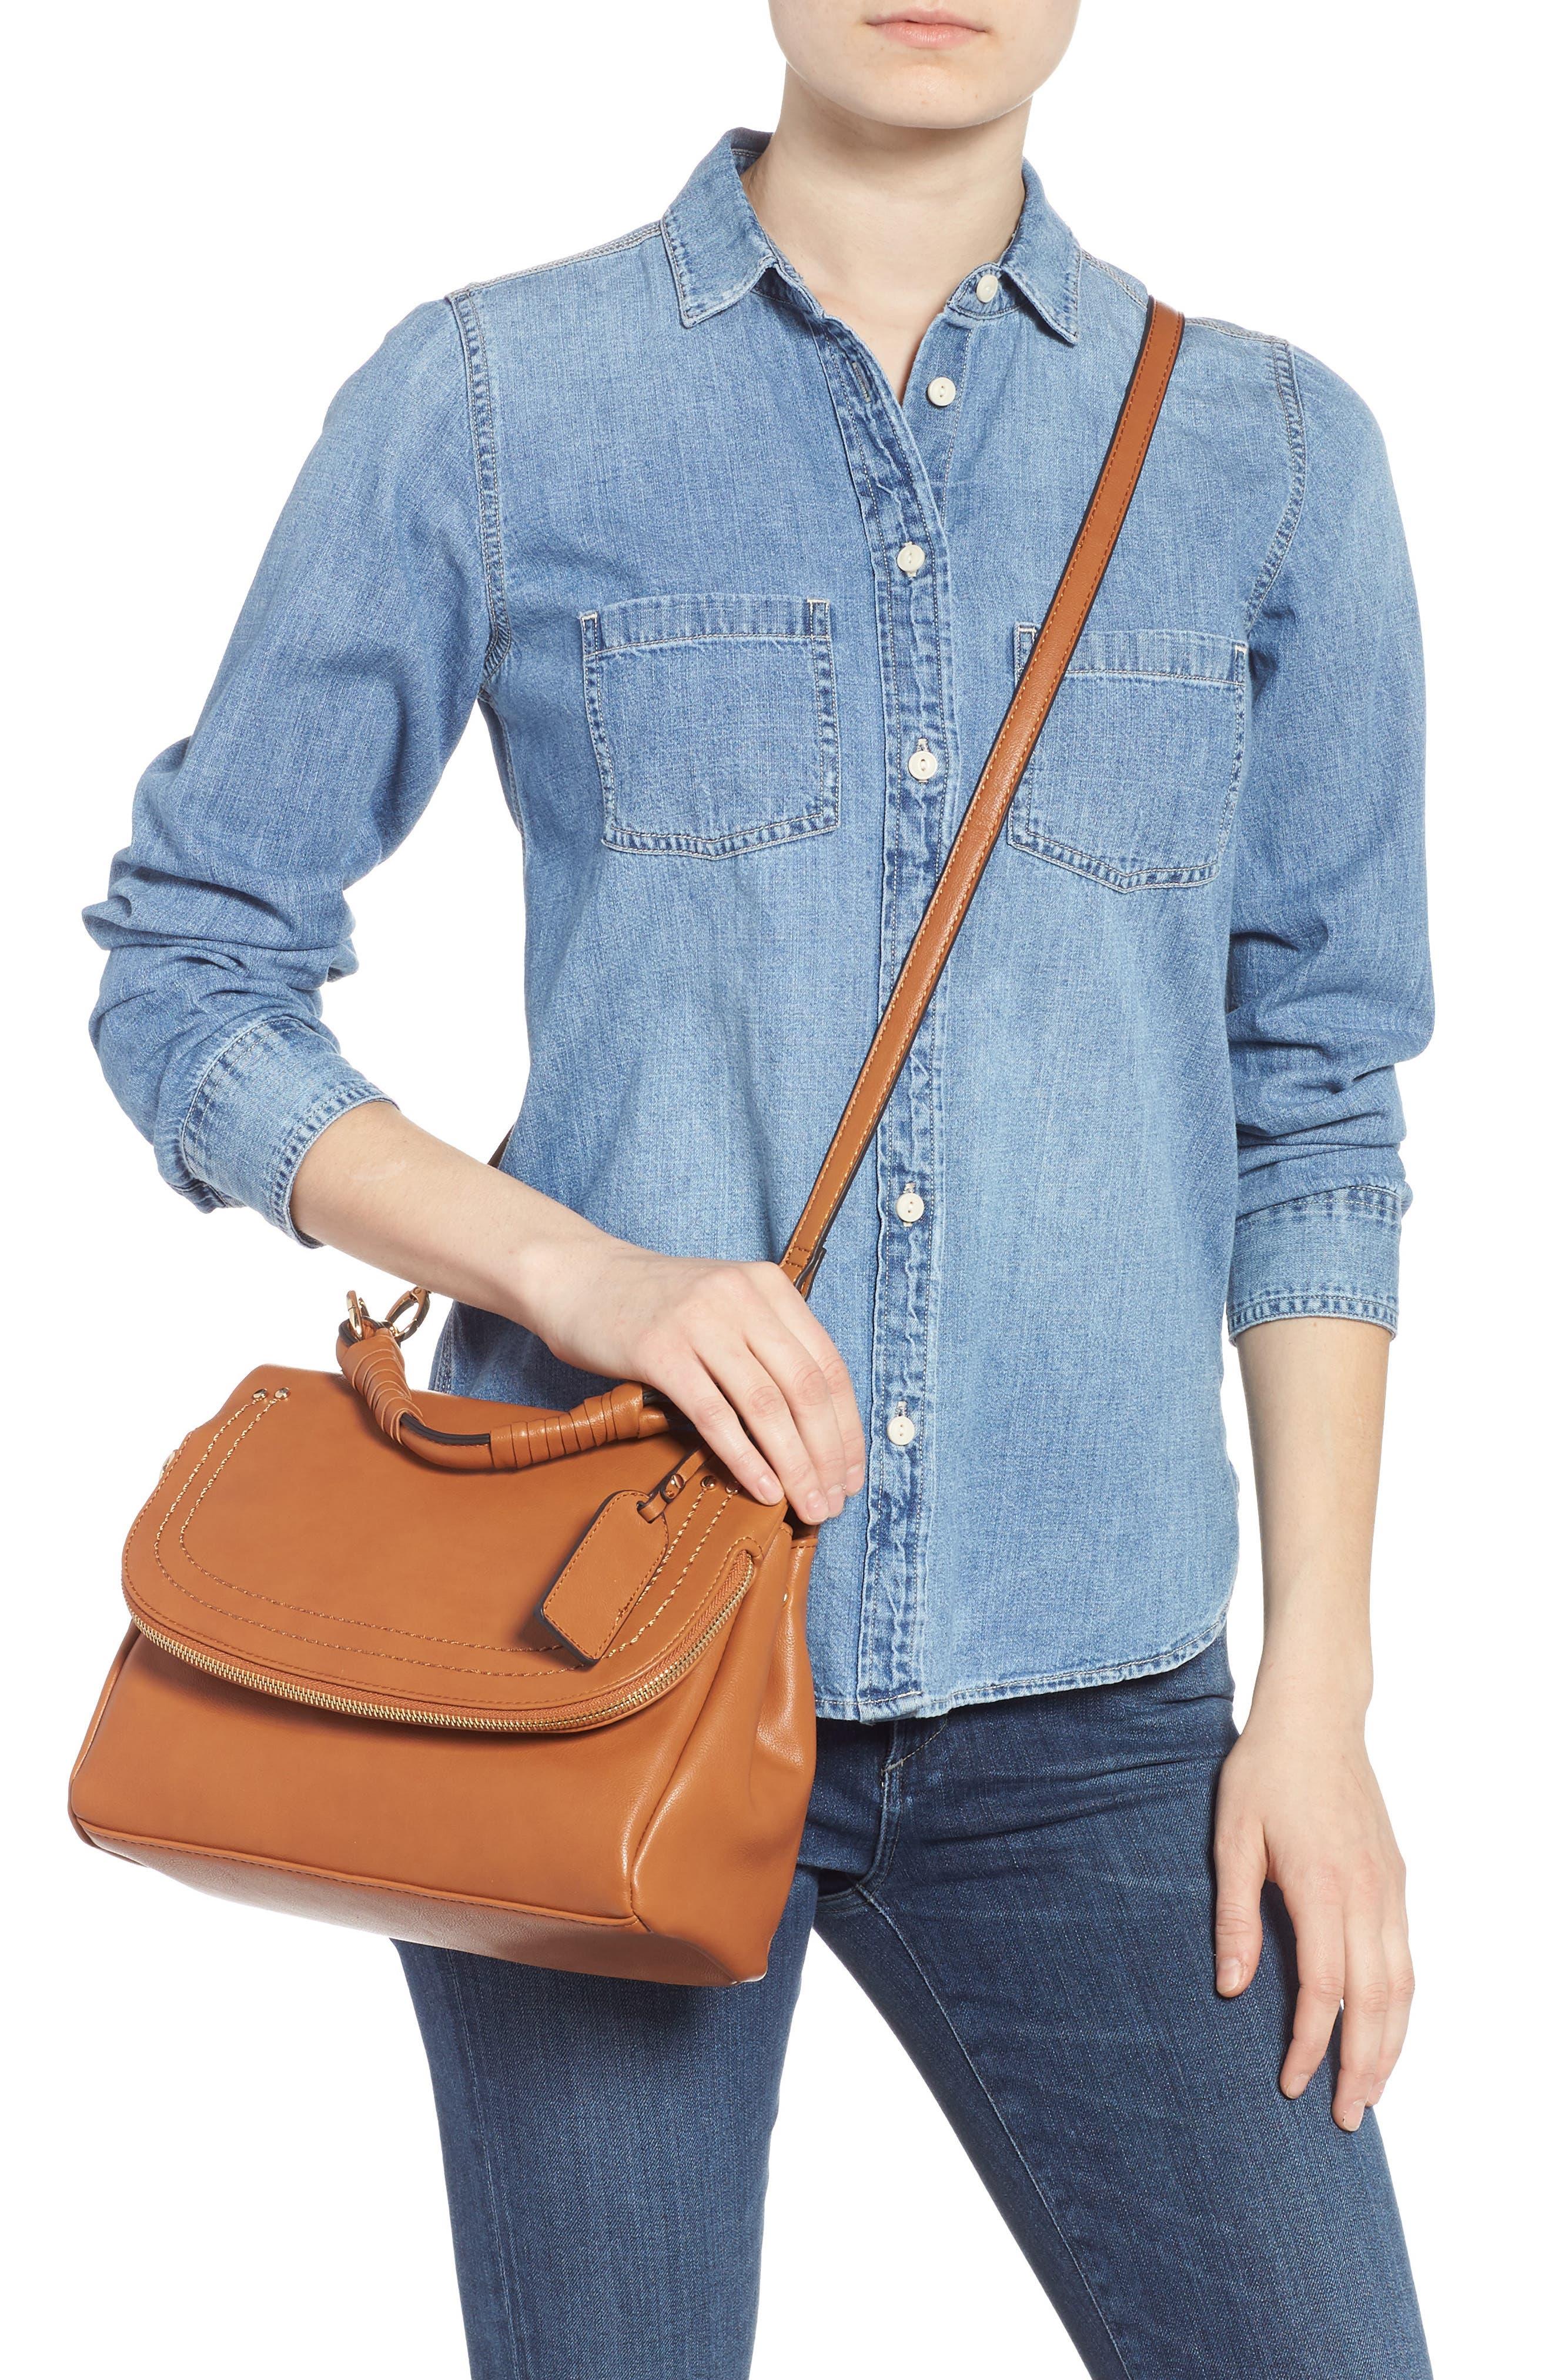 SOLE SOCIETY, Rubie Faux Leather Crossbody Bag, Alternate thumbnail 2, color, COGNAC